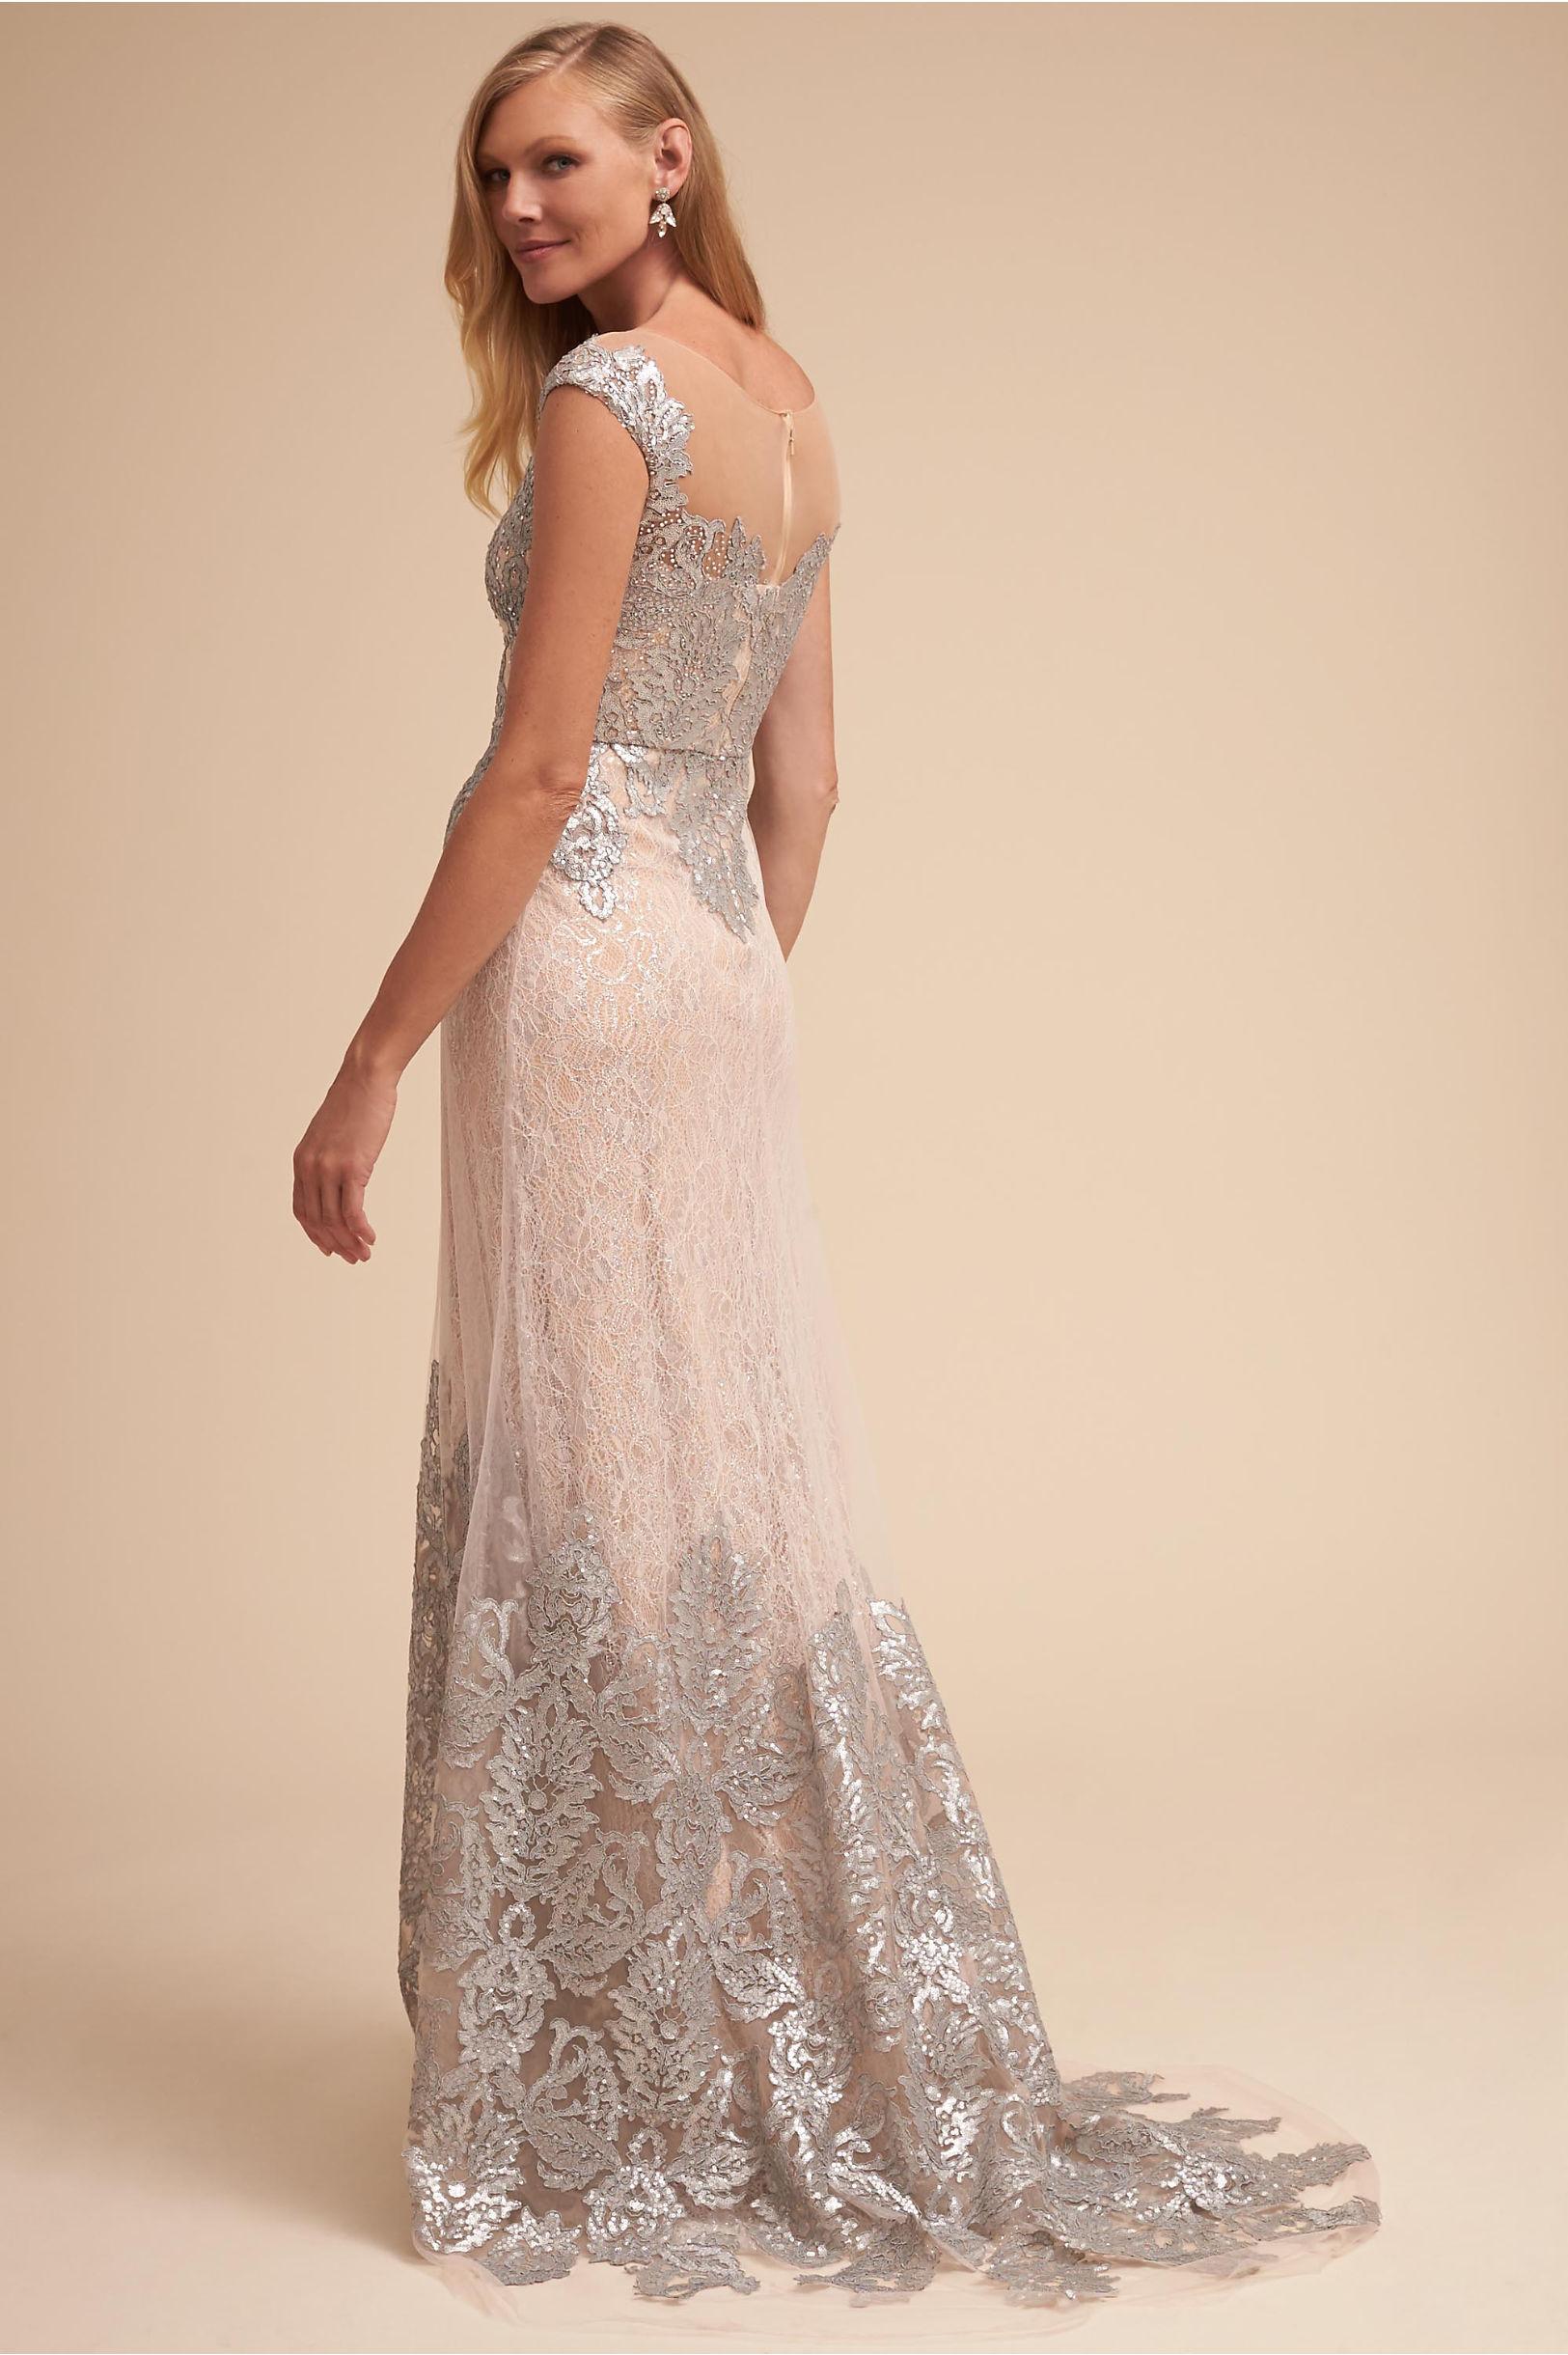 Keller dress gunmetalnude in bride bhldn gunmetalnude keller dress bhldn ombrellifo Choice Image